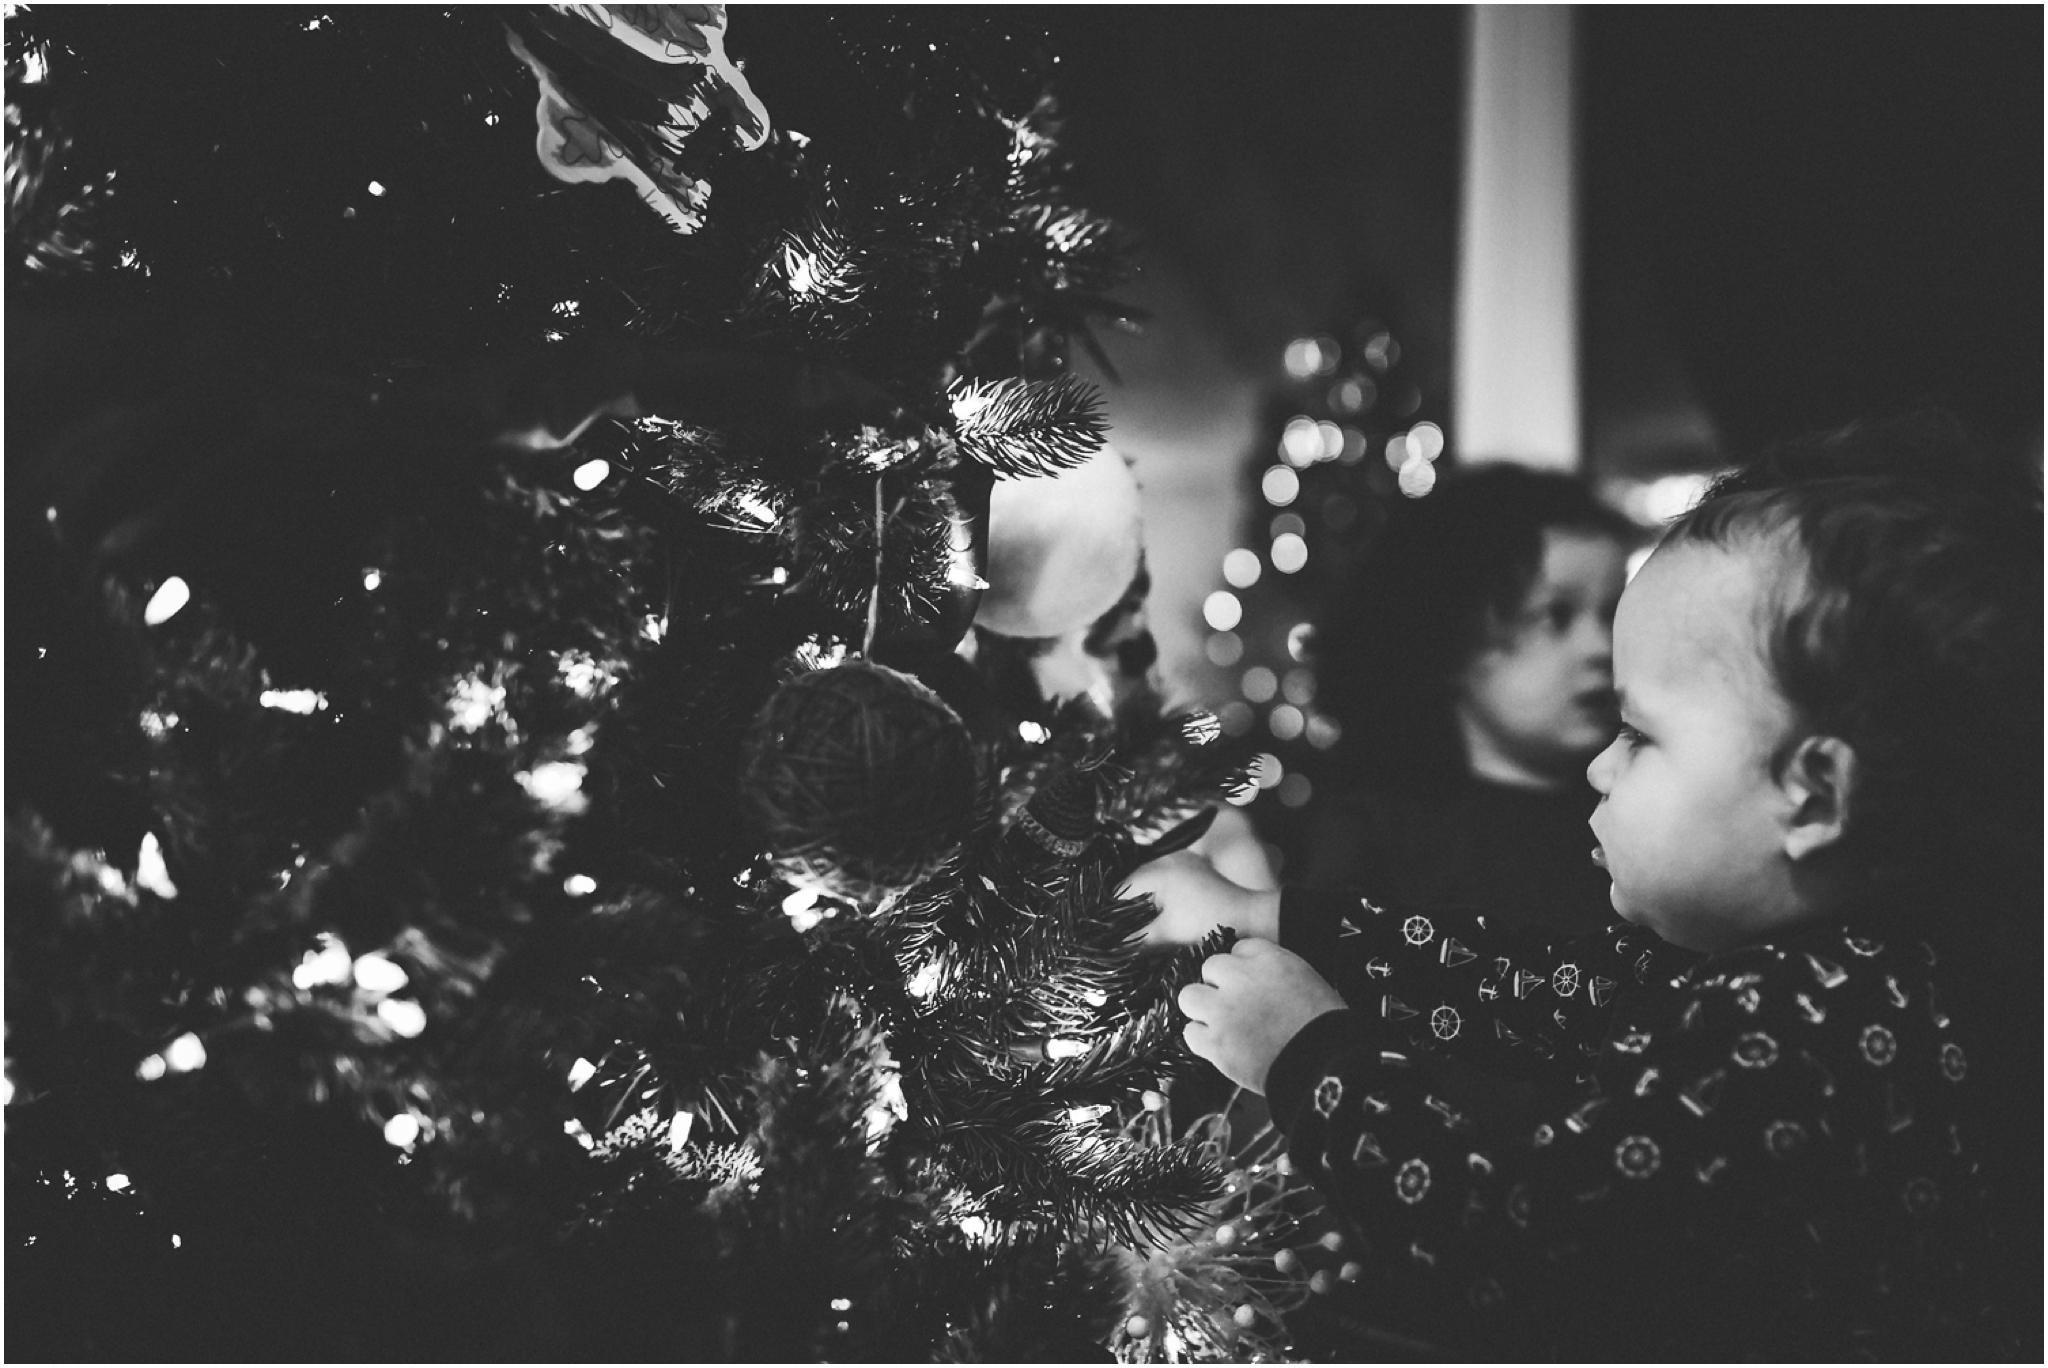 Edmonton documentary photographer - Best of 2016 - Christmas - Tree decorating - christmas tree - YEG - holiday season